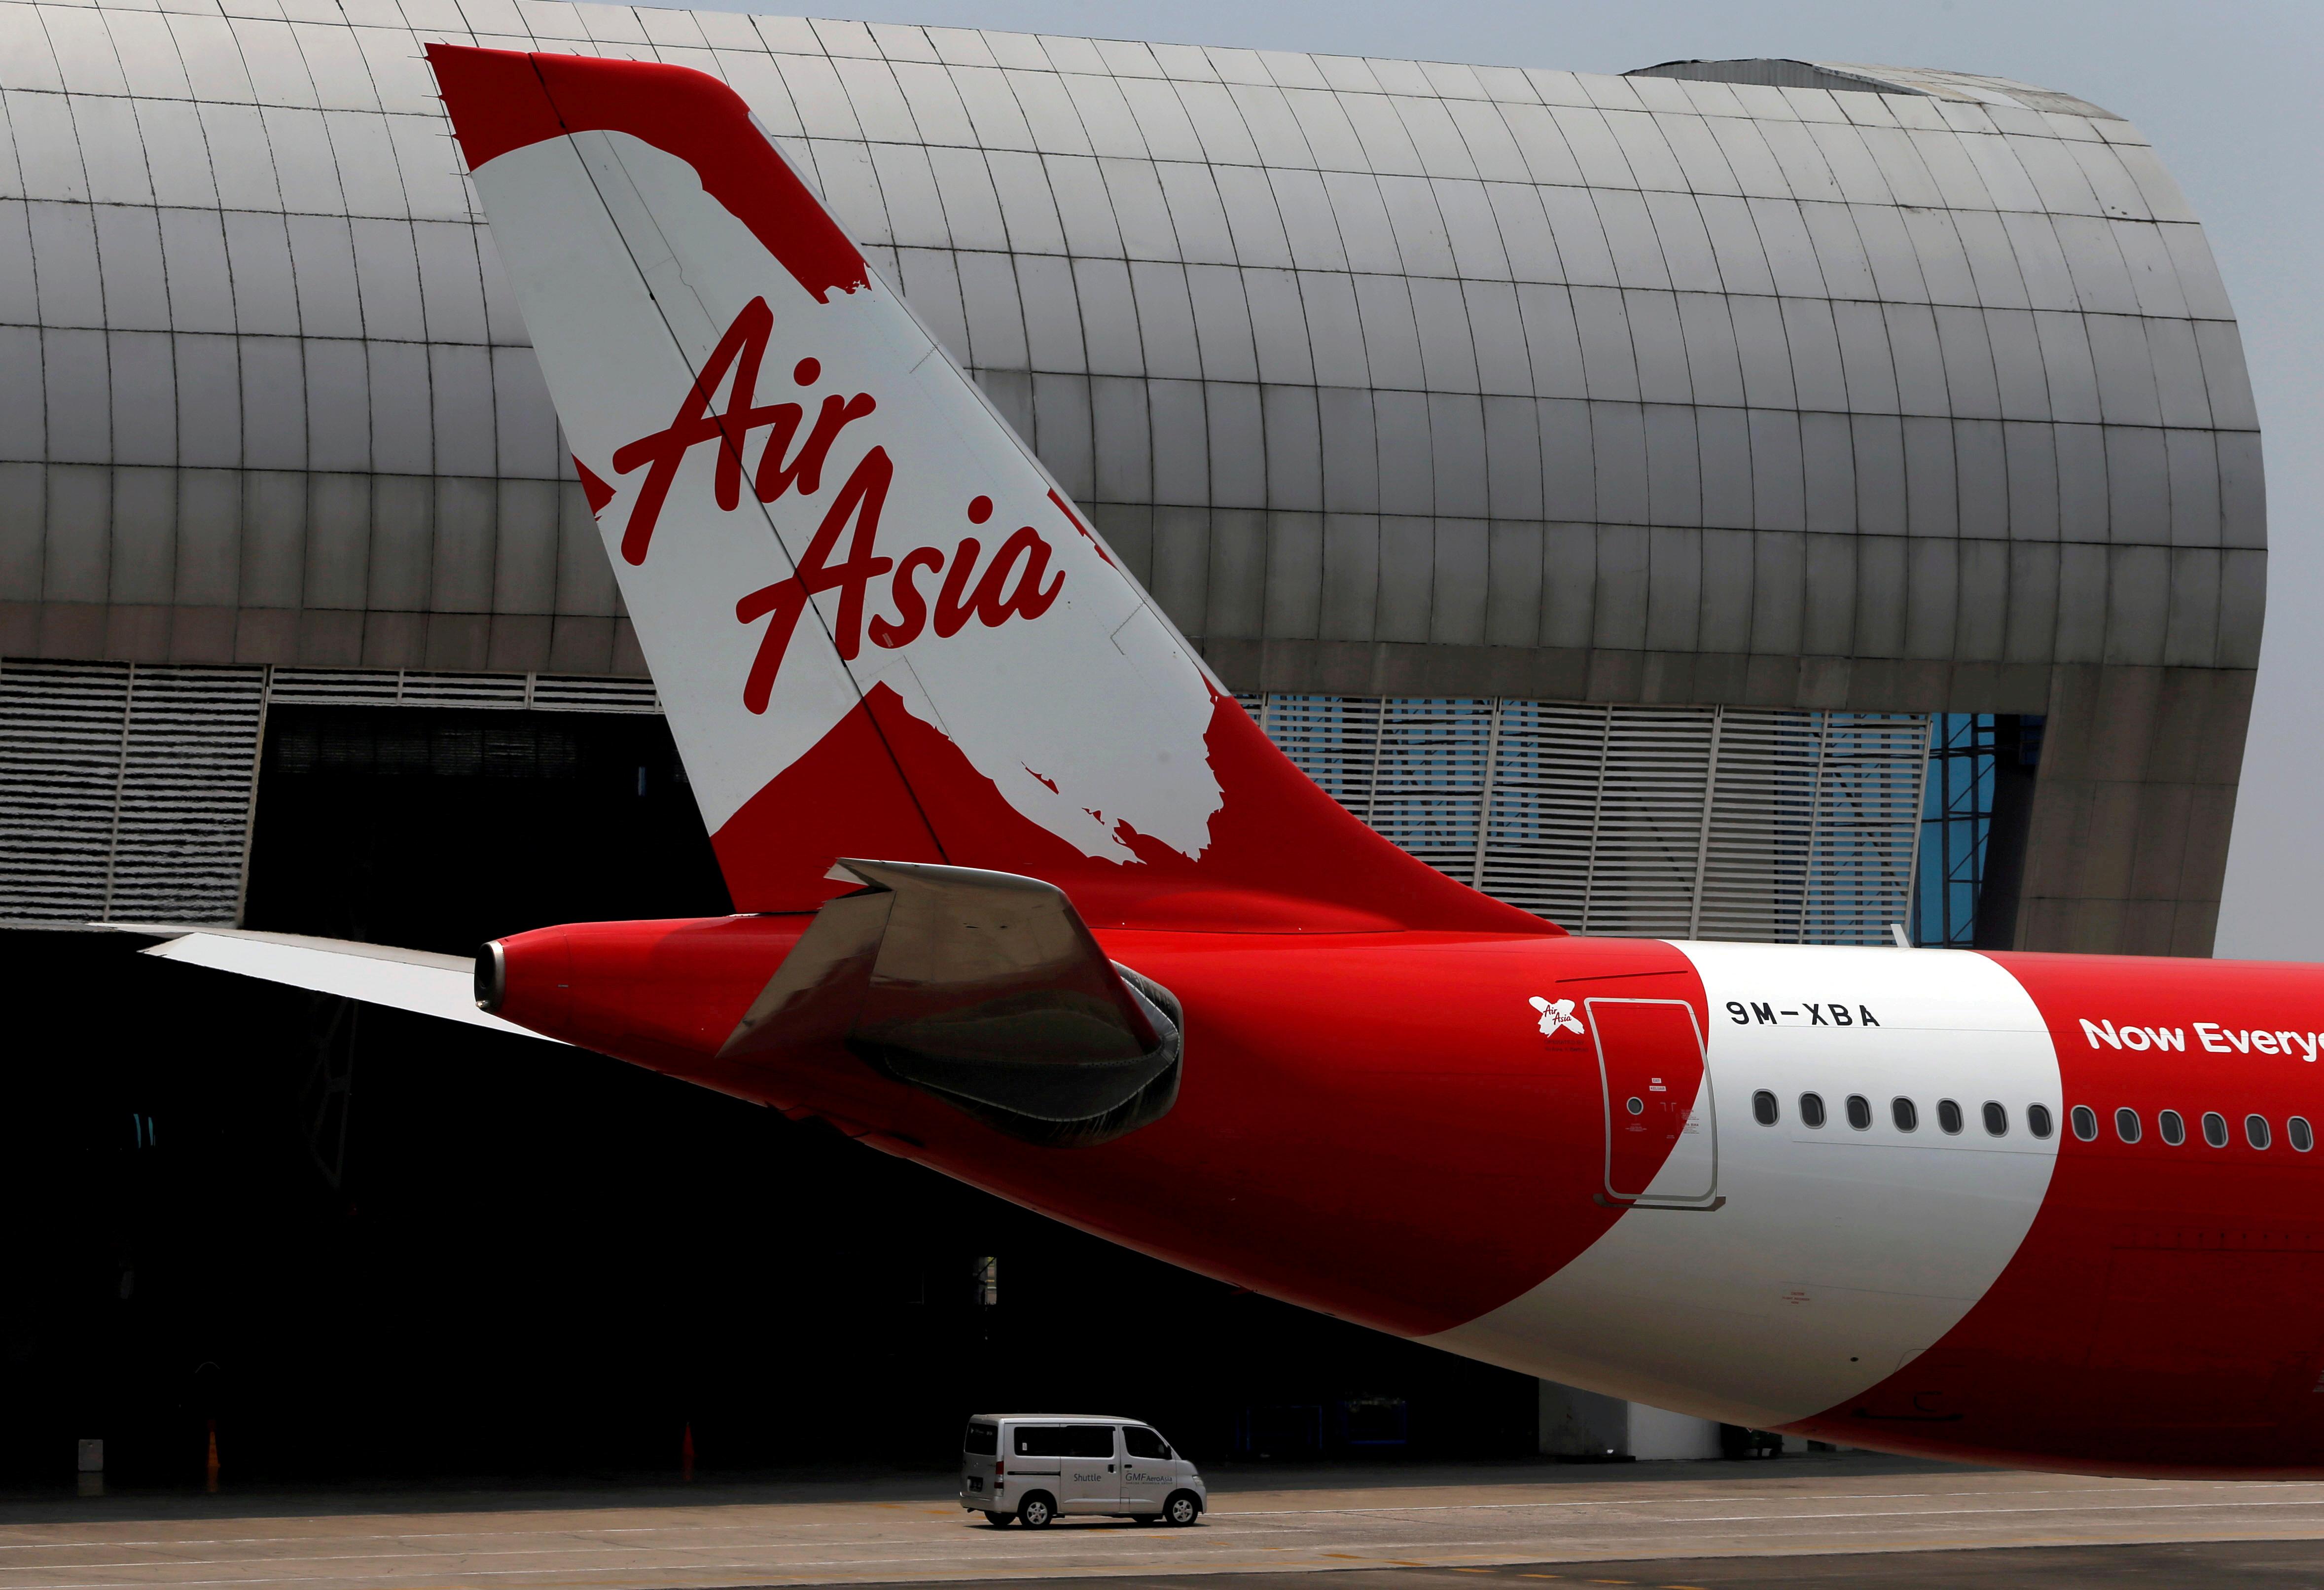 Tail of AirAsia X plane as seen at the Garuda Maintenance Facility AeroAsia in Tangerang, Indonesia, September 20, 2017.  REUTERS/Beawiharta